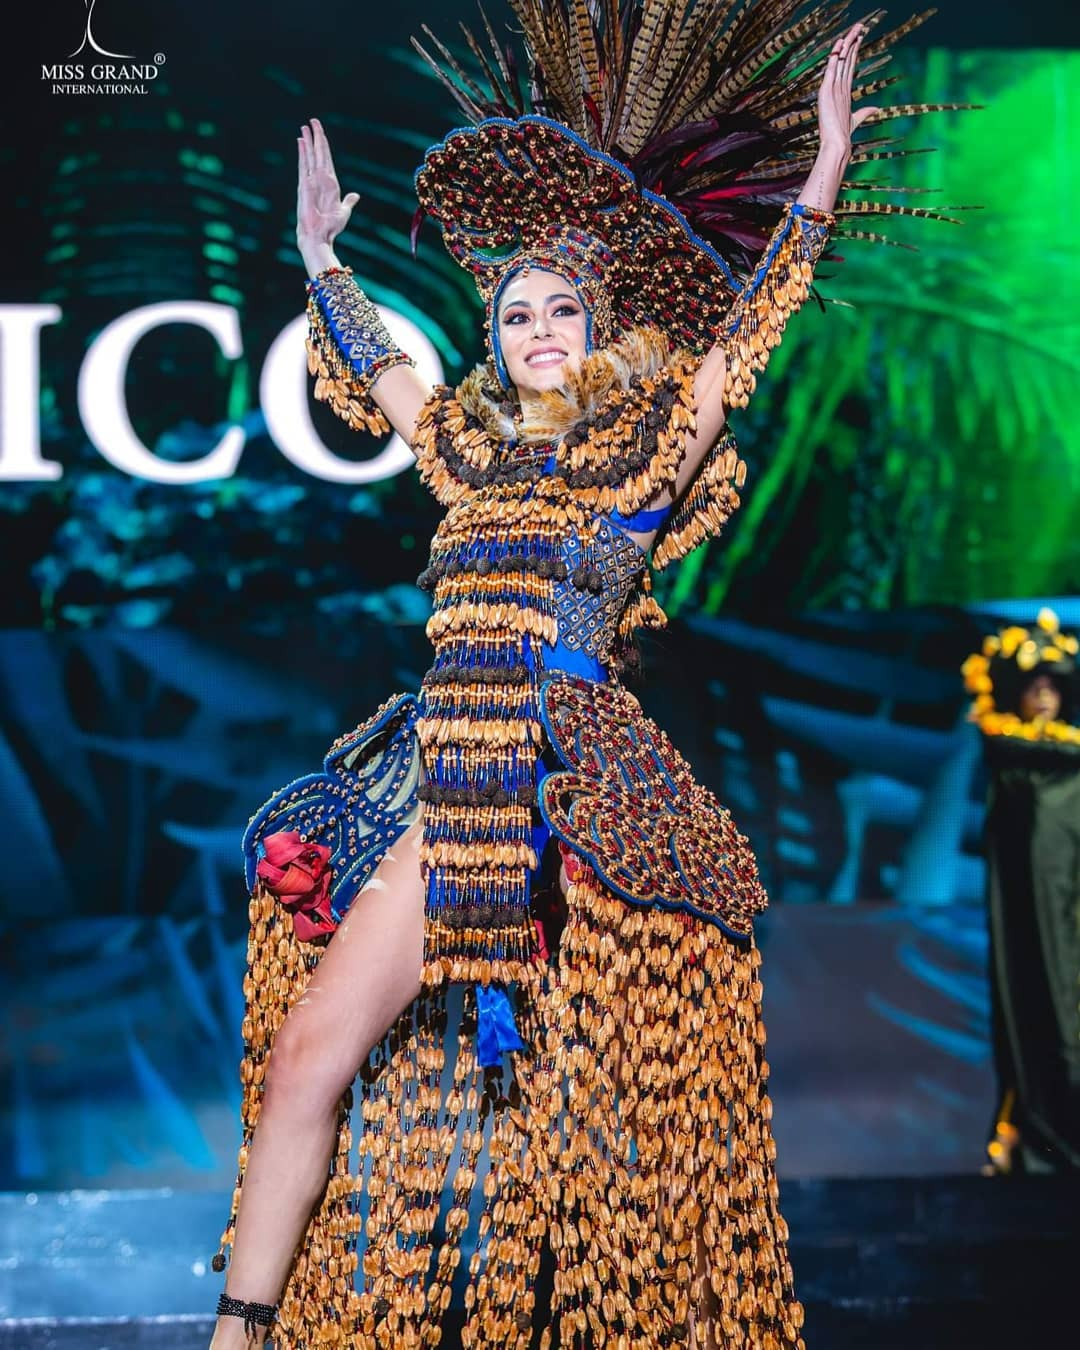 maria malo, 1st runner-up de miss grand international 2019. - Página 15 72787910